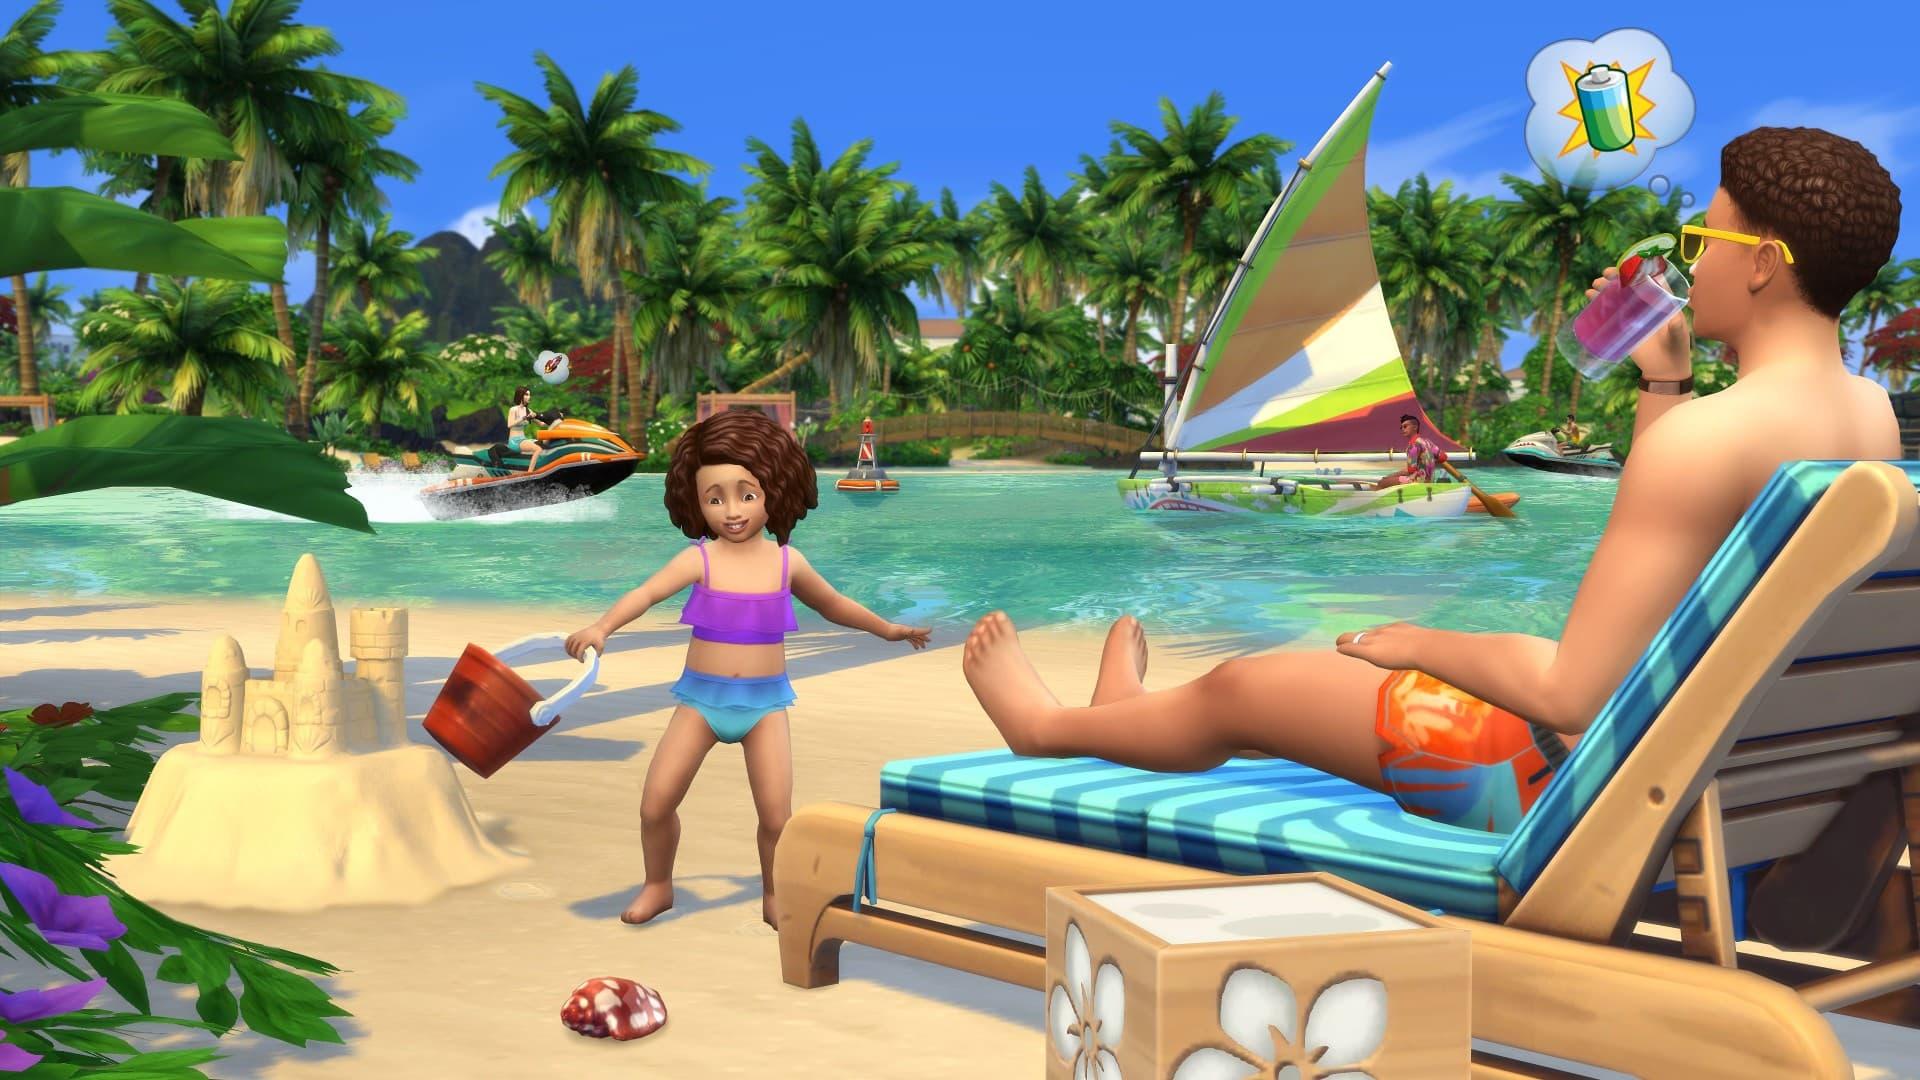 Les Sims 4: Iles paradisiaques Xbox